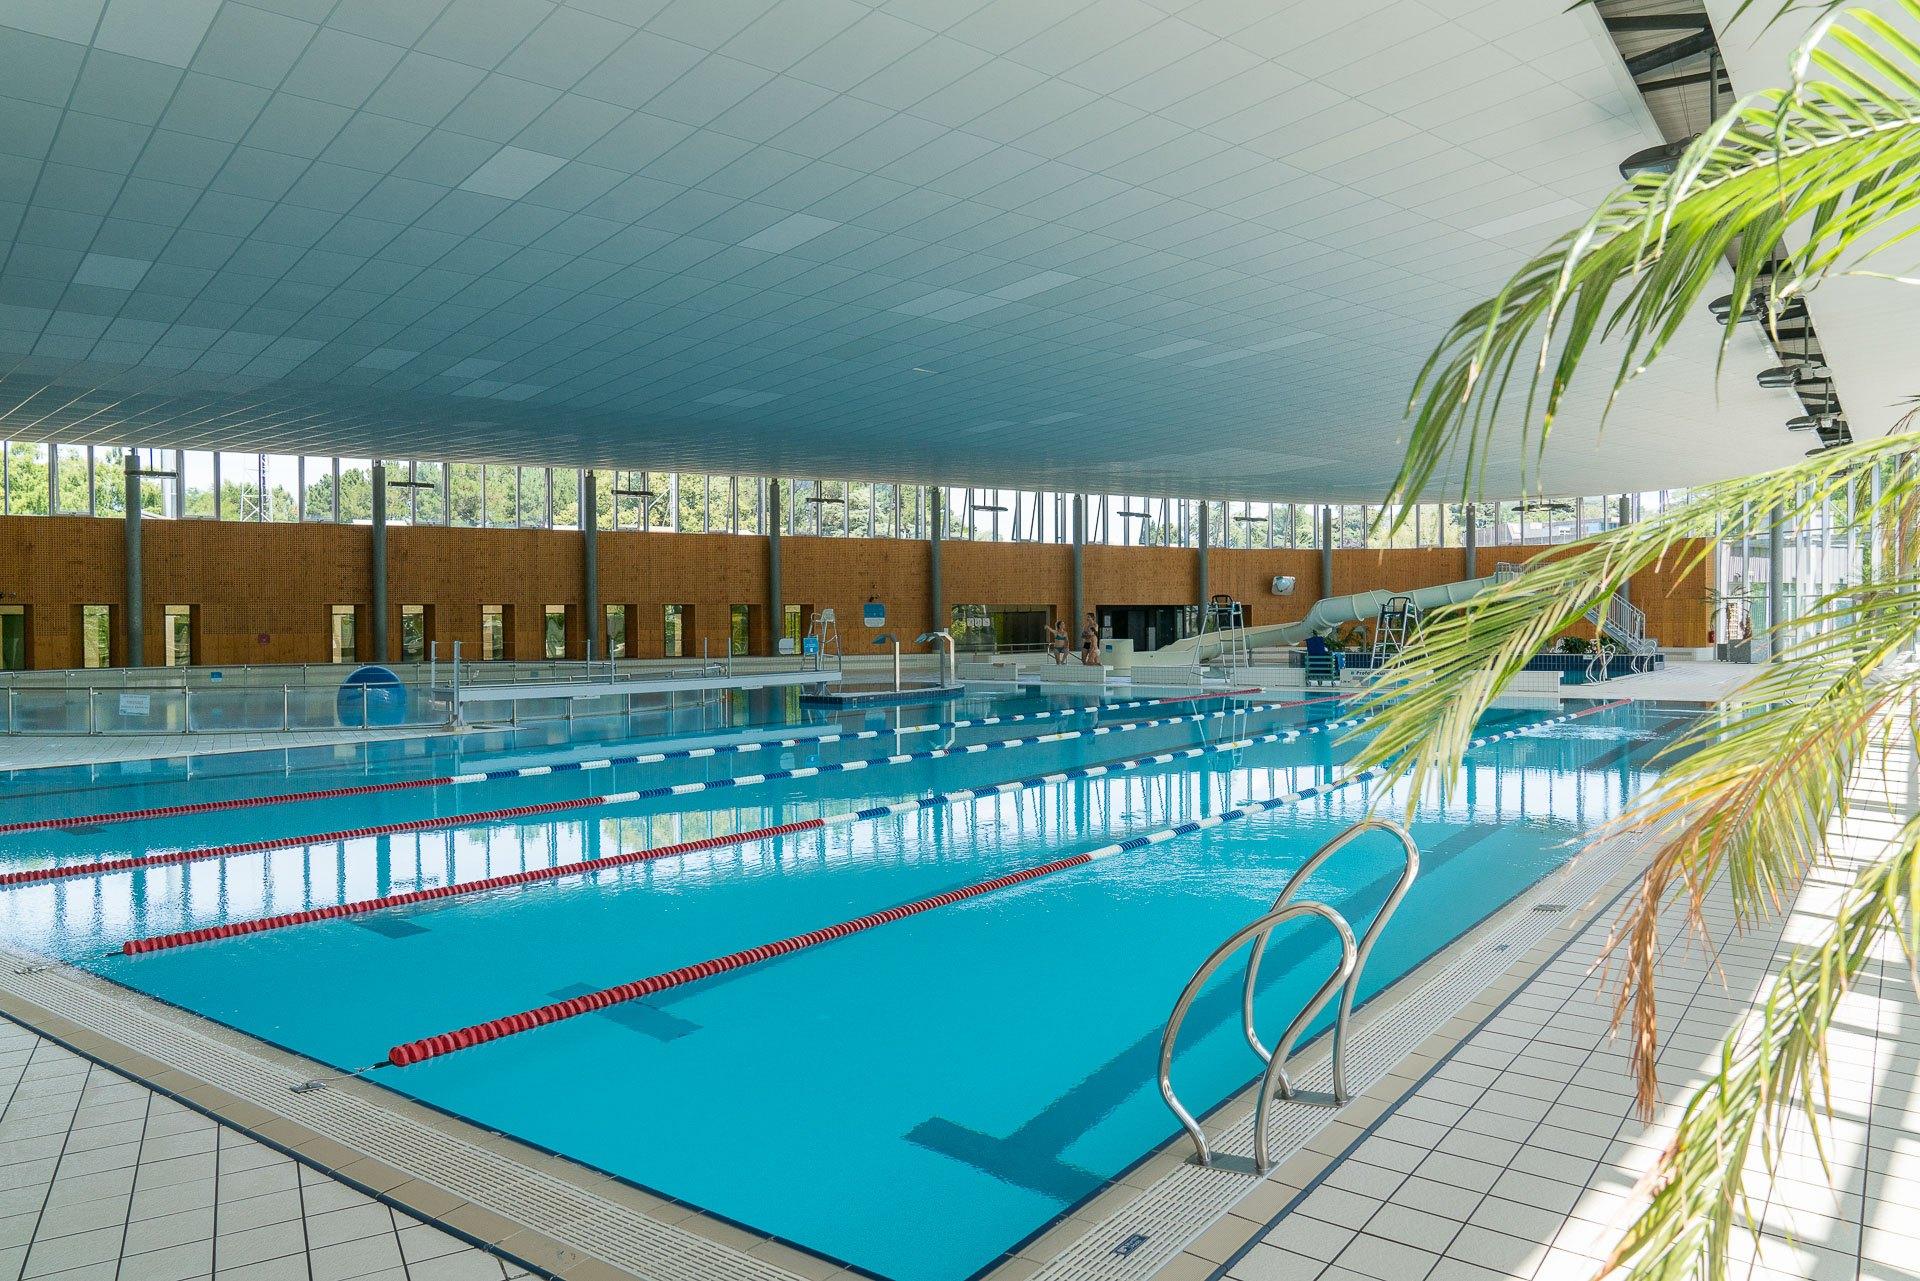 Swimmingpool Des Petit Port   Nantes Camping   Aquapark pour Pisciniste Nantes